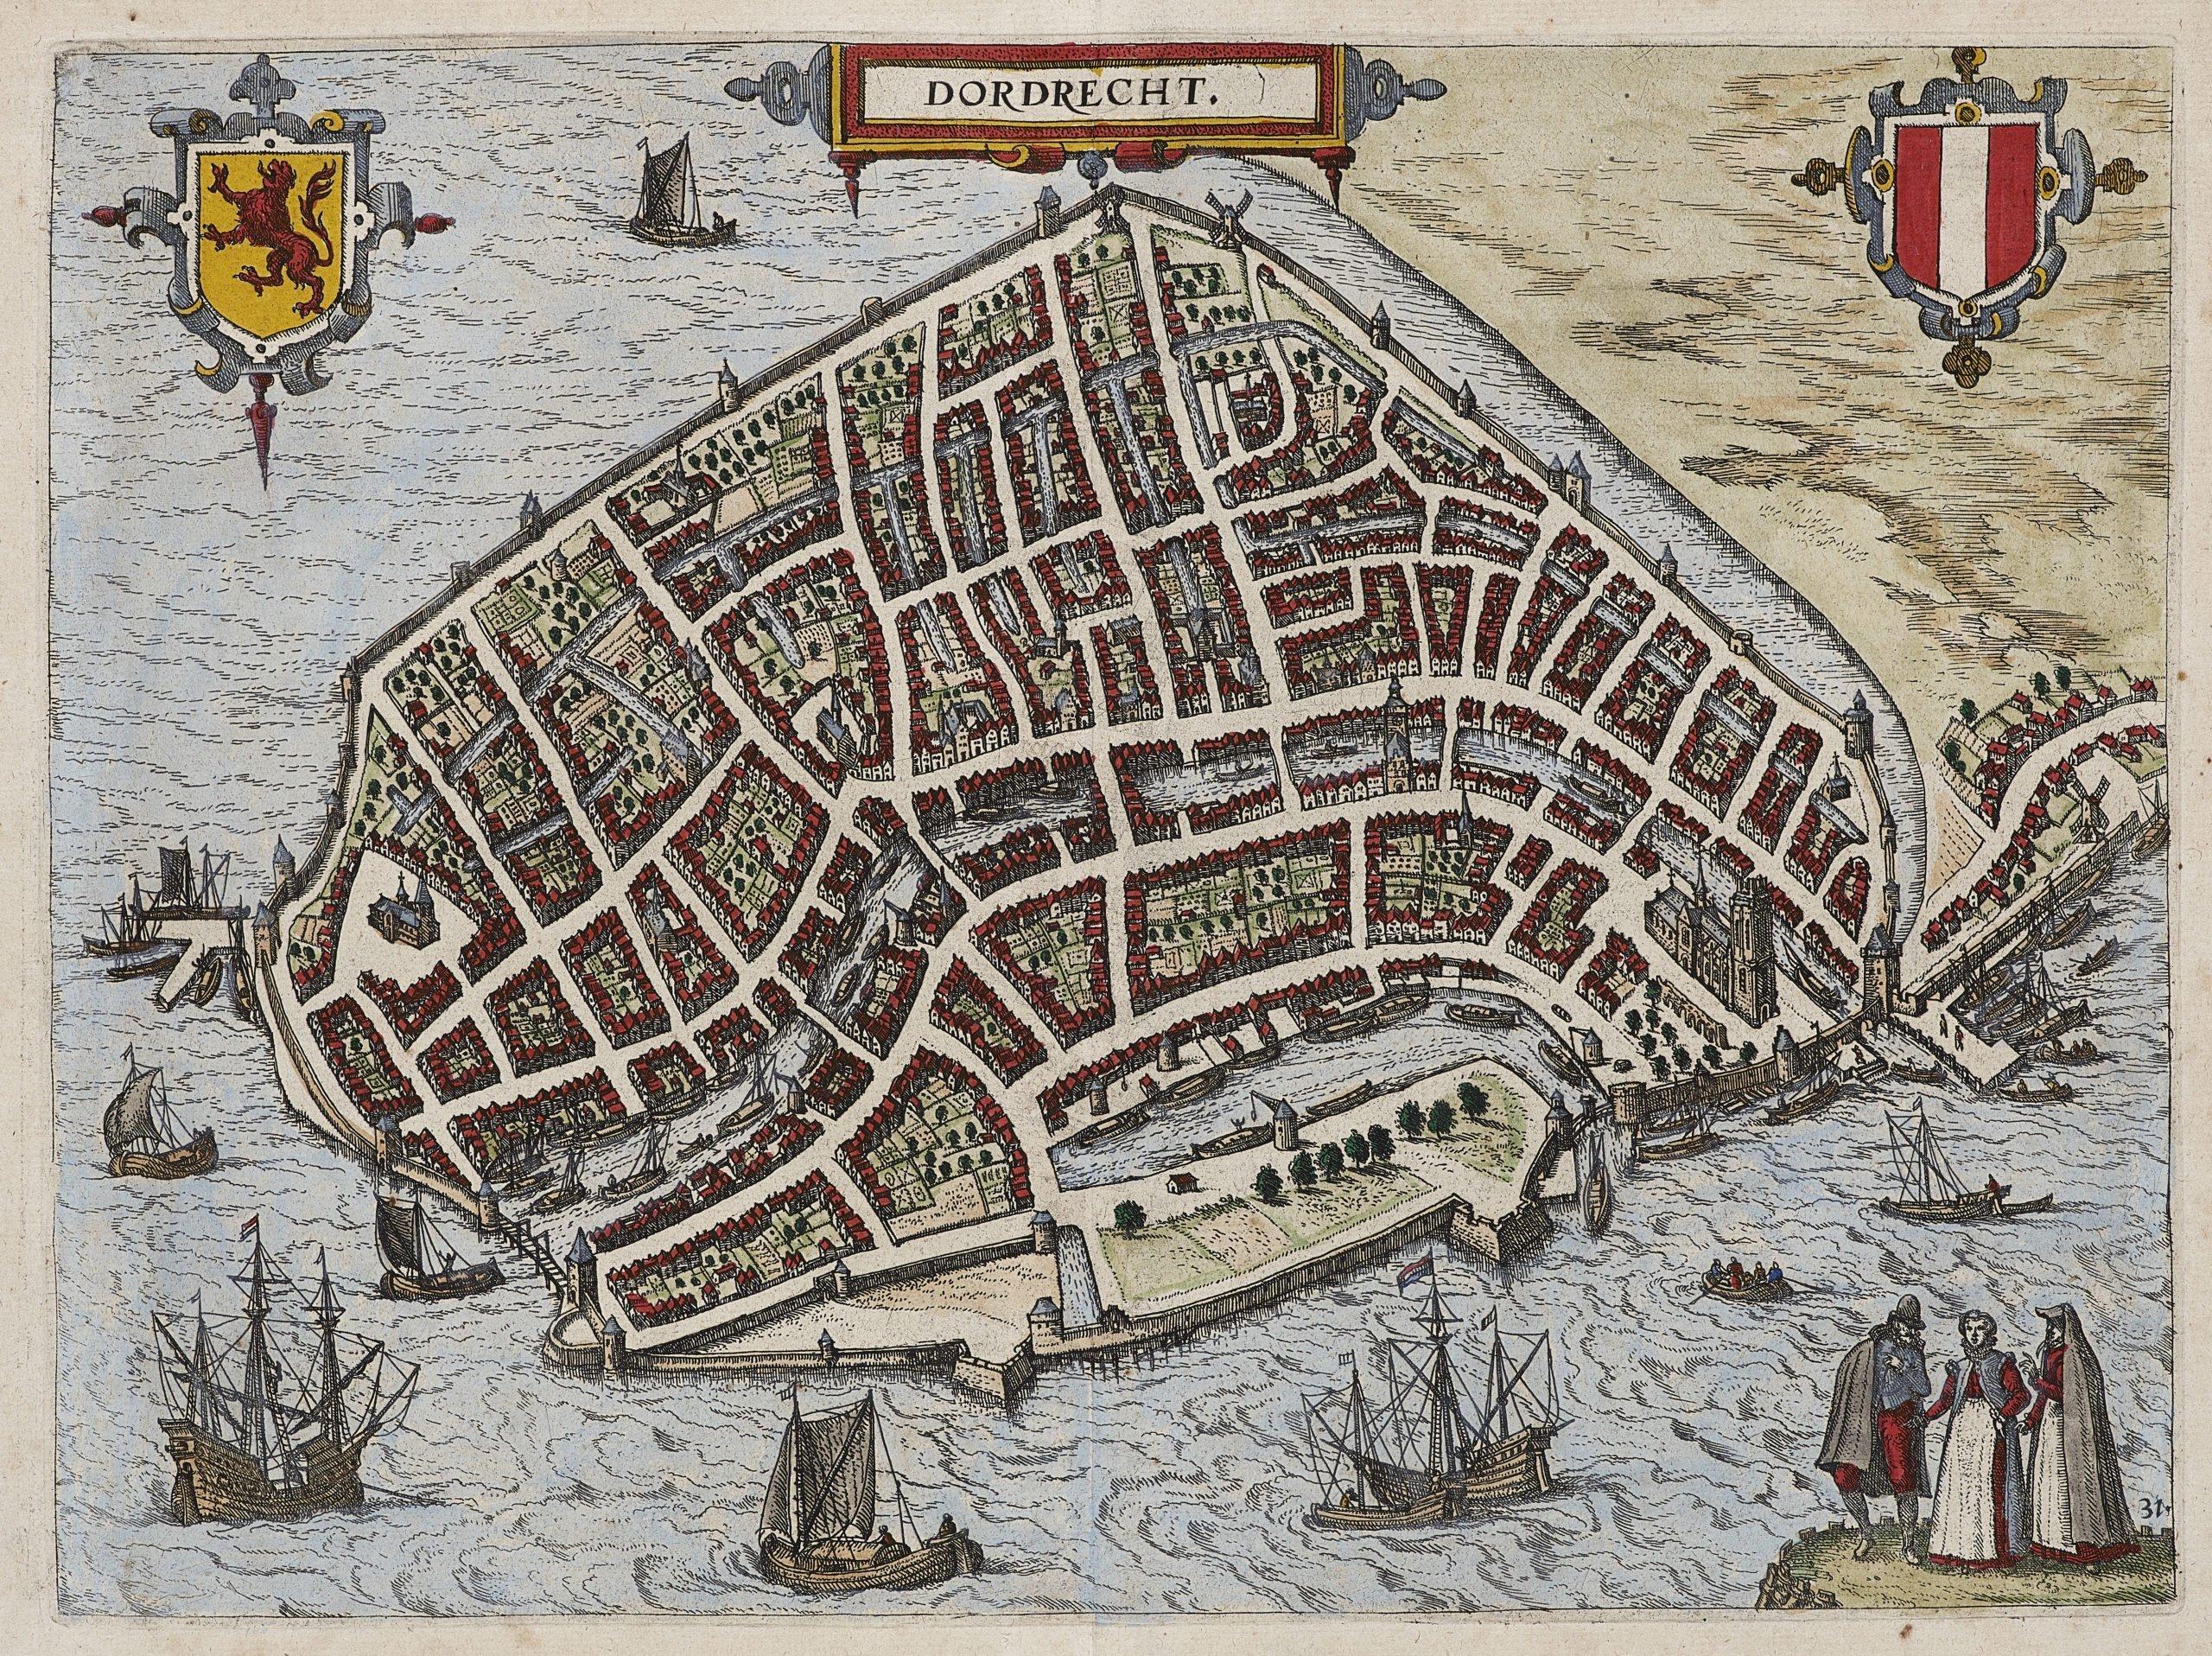 Old map Dordrecht by Guicciardini, 1582